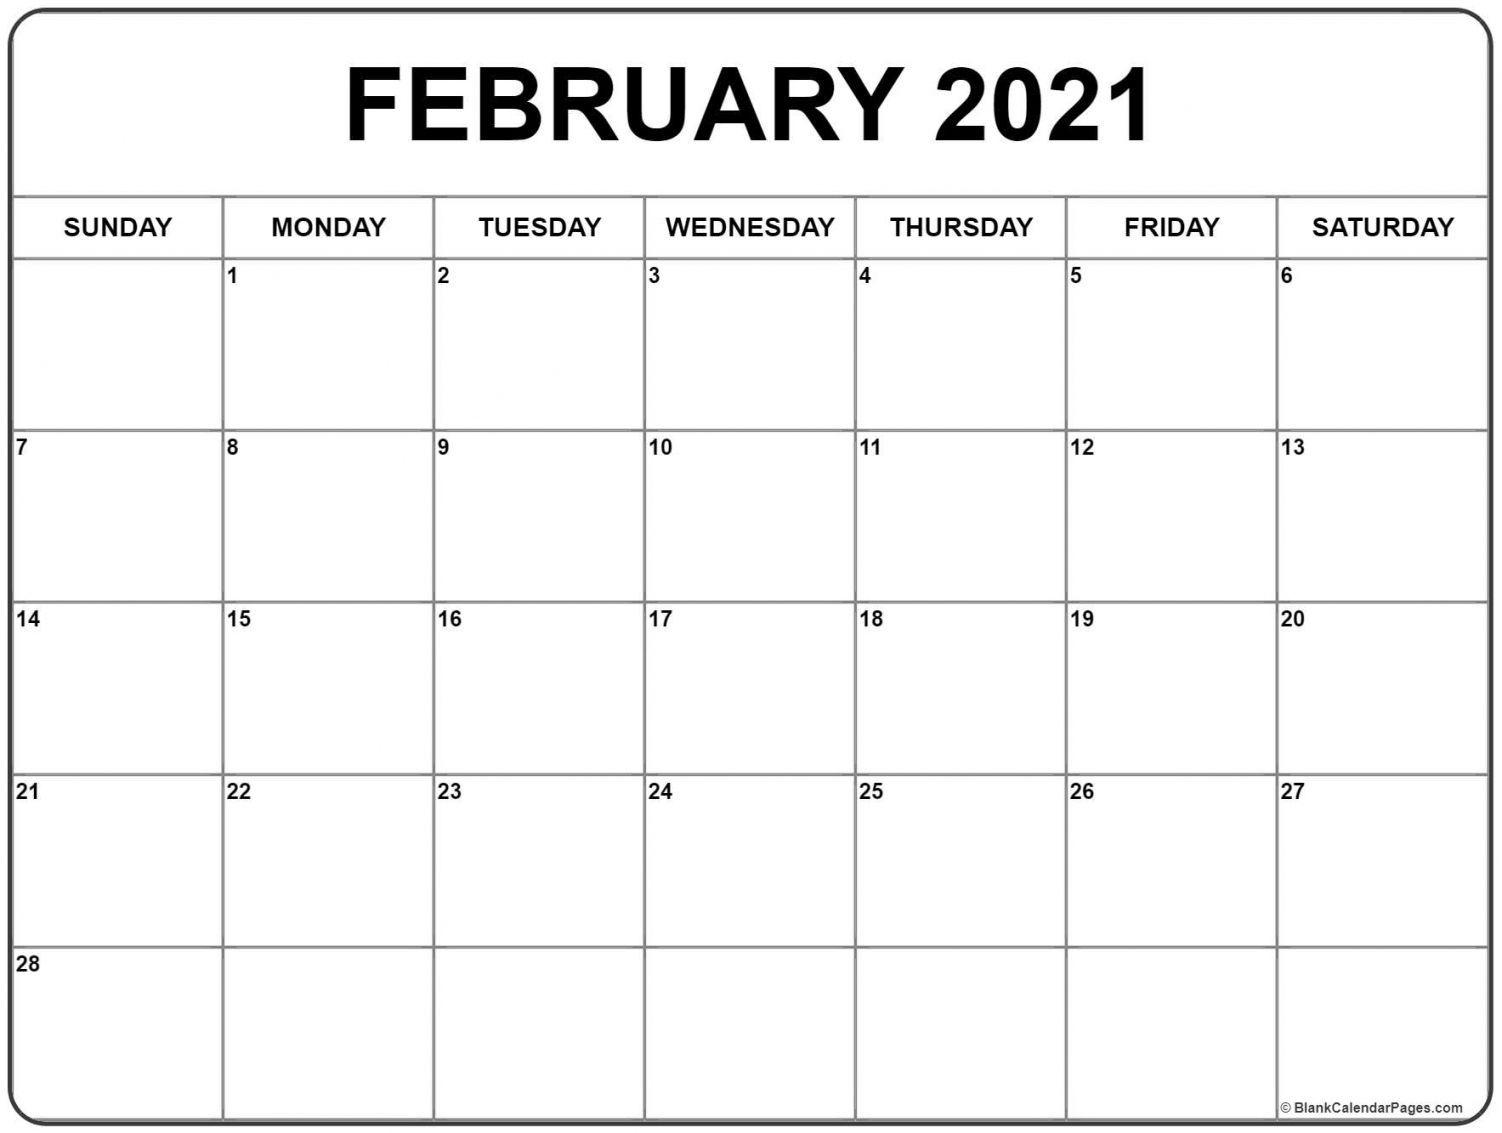 February 2021 Calendar Templates In 2020 | Calendar